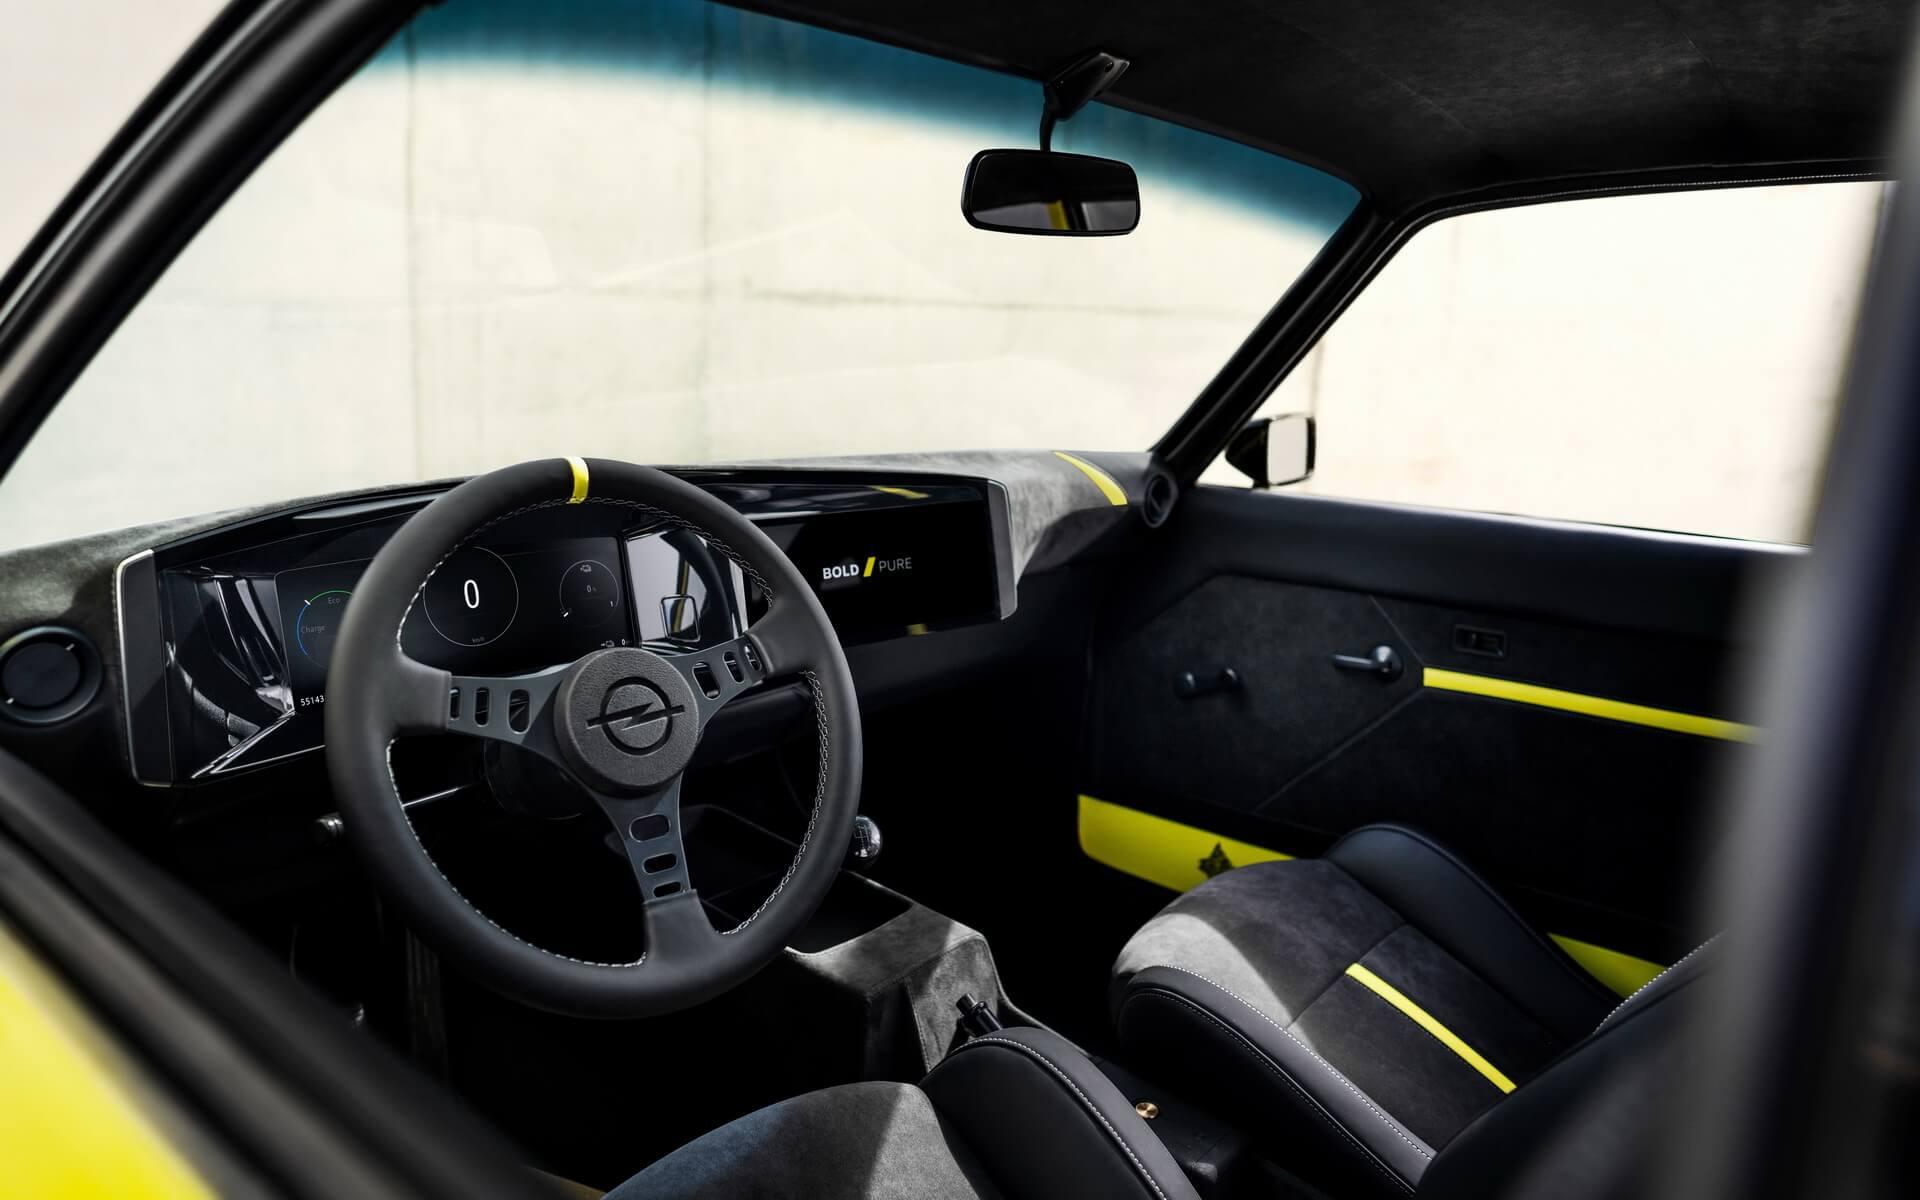 Интерьер спортивного электрокара Opel Manta ElektroMOD